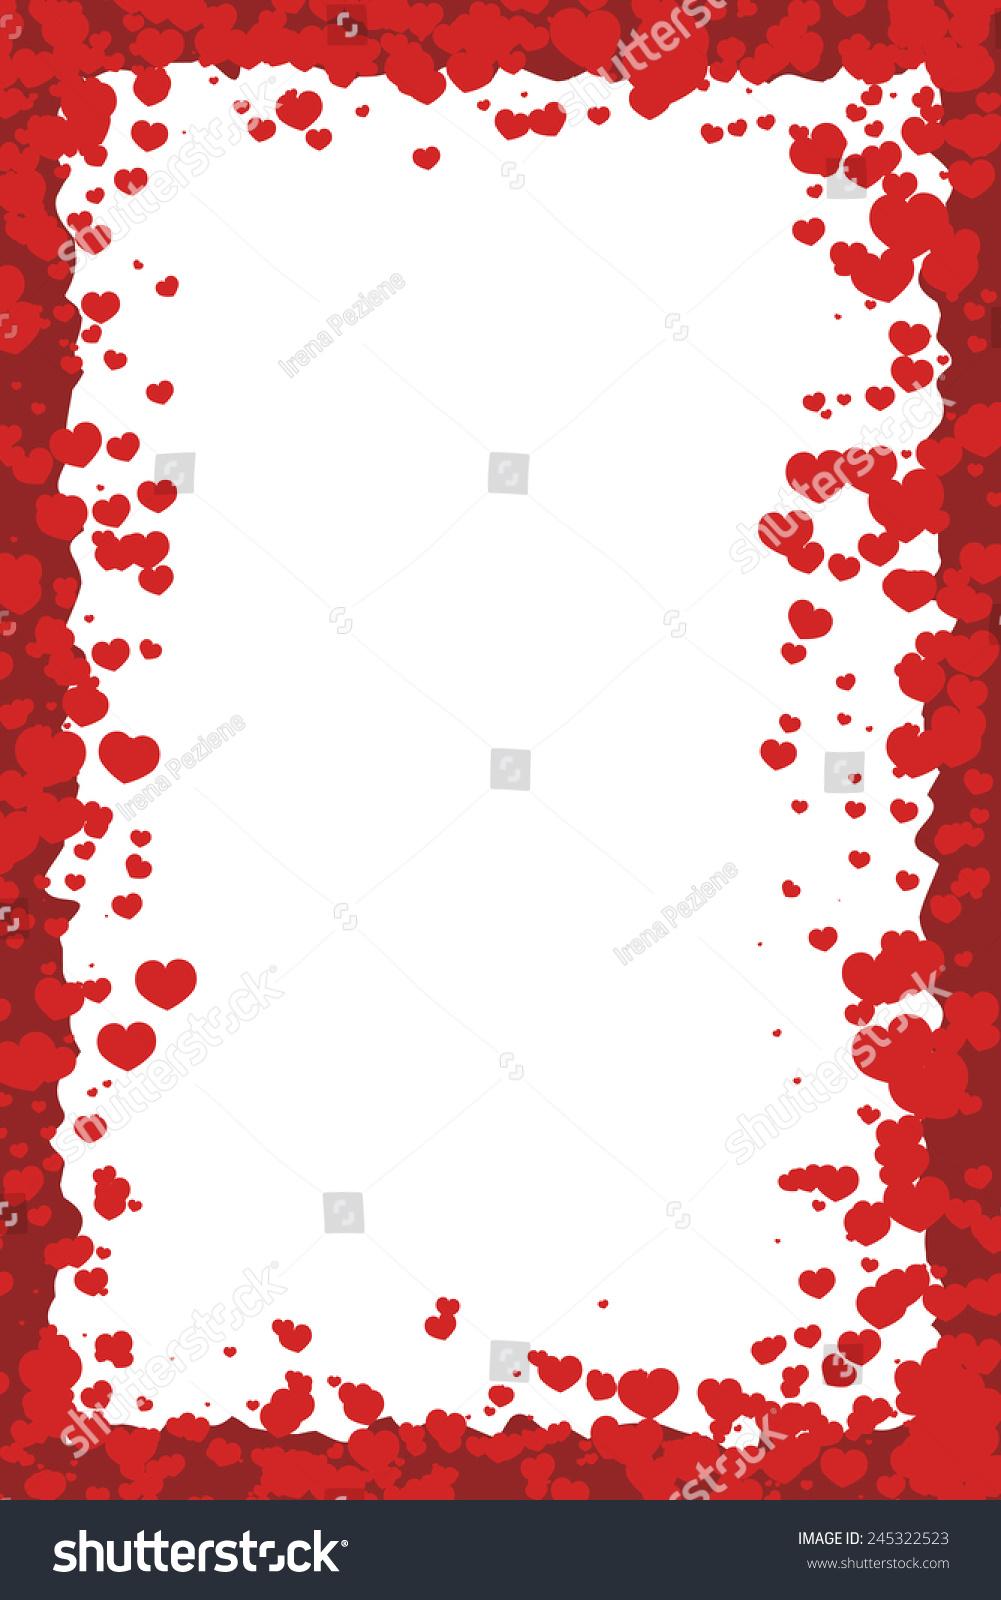 Valentines Day Border Hearts Stock Vector Royalty Free 245322523